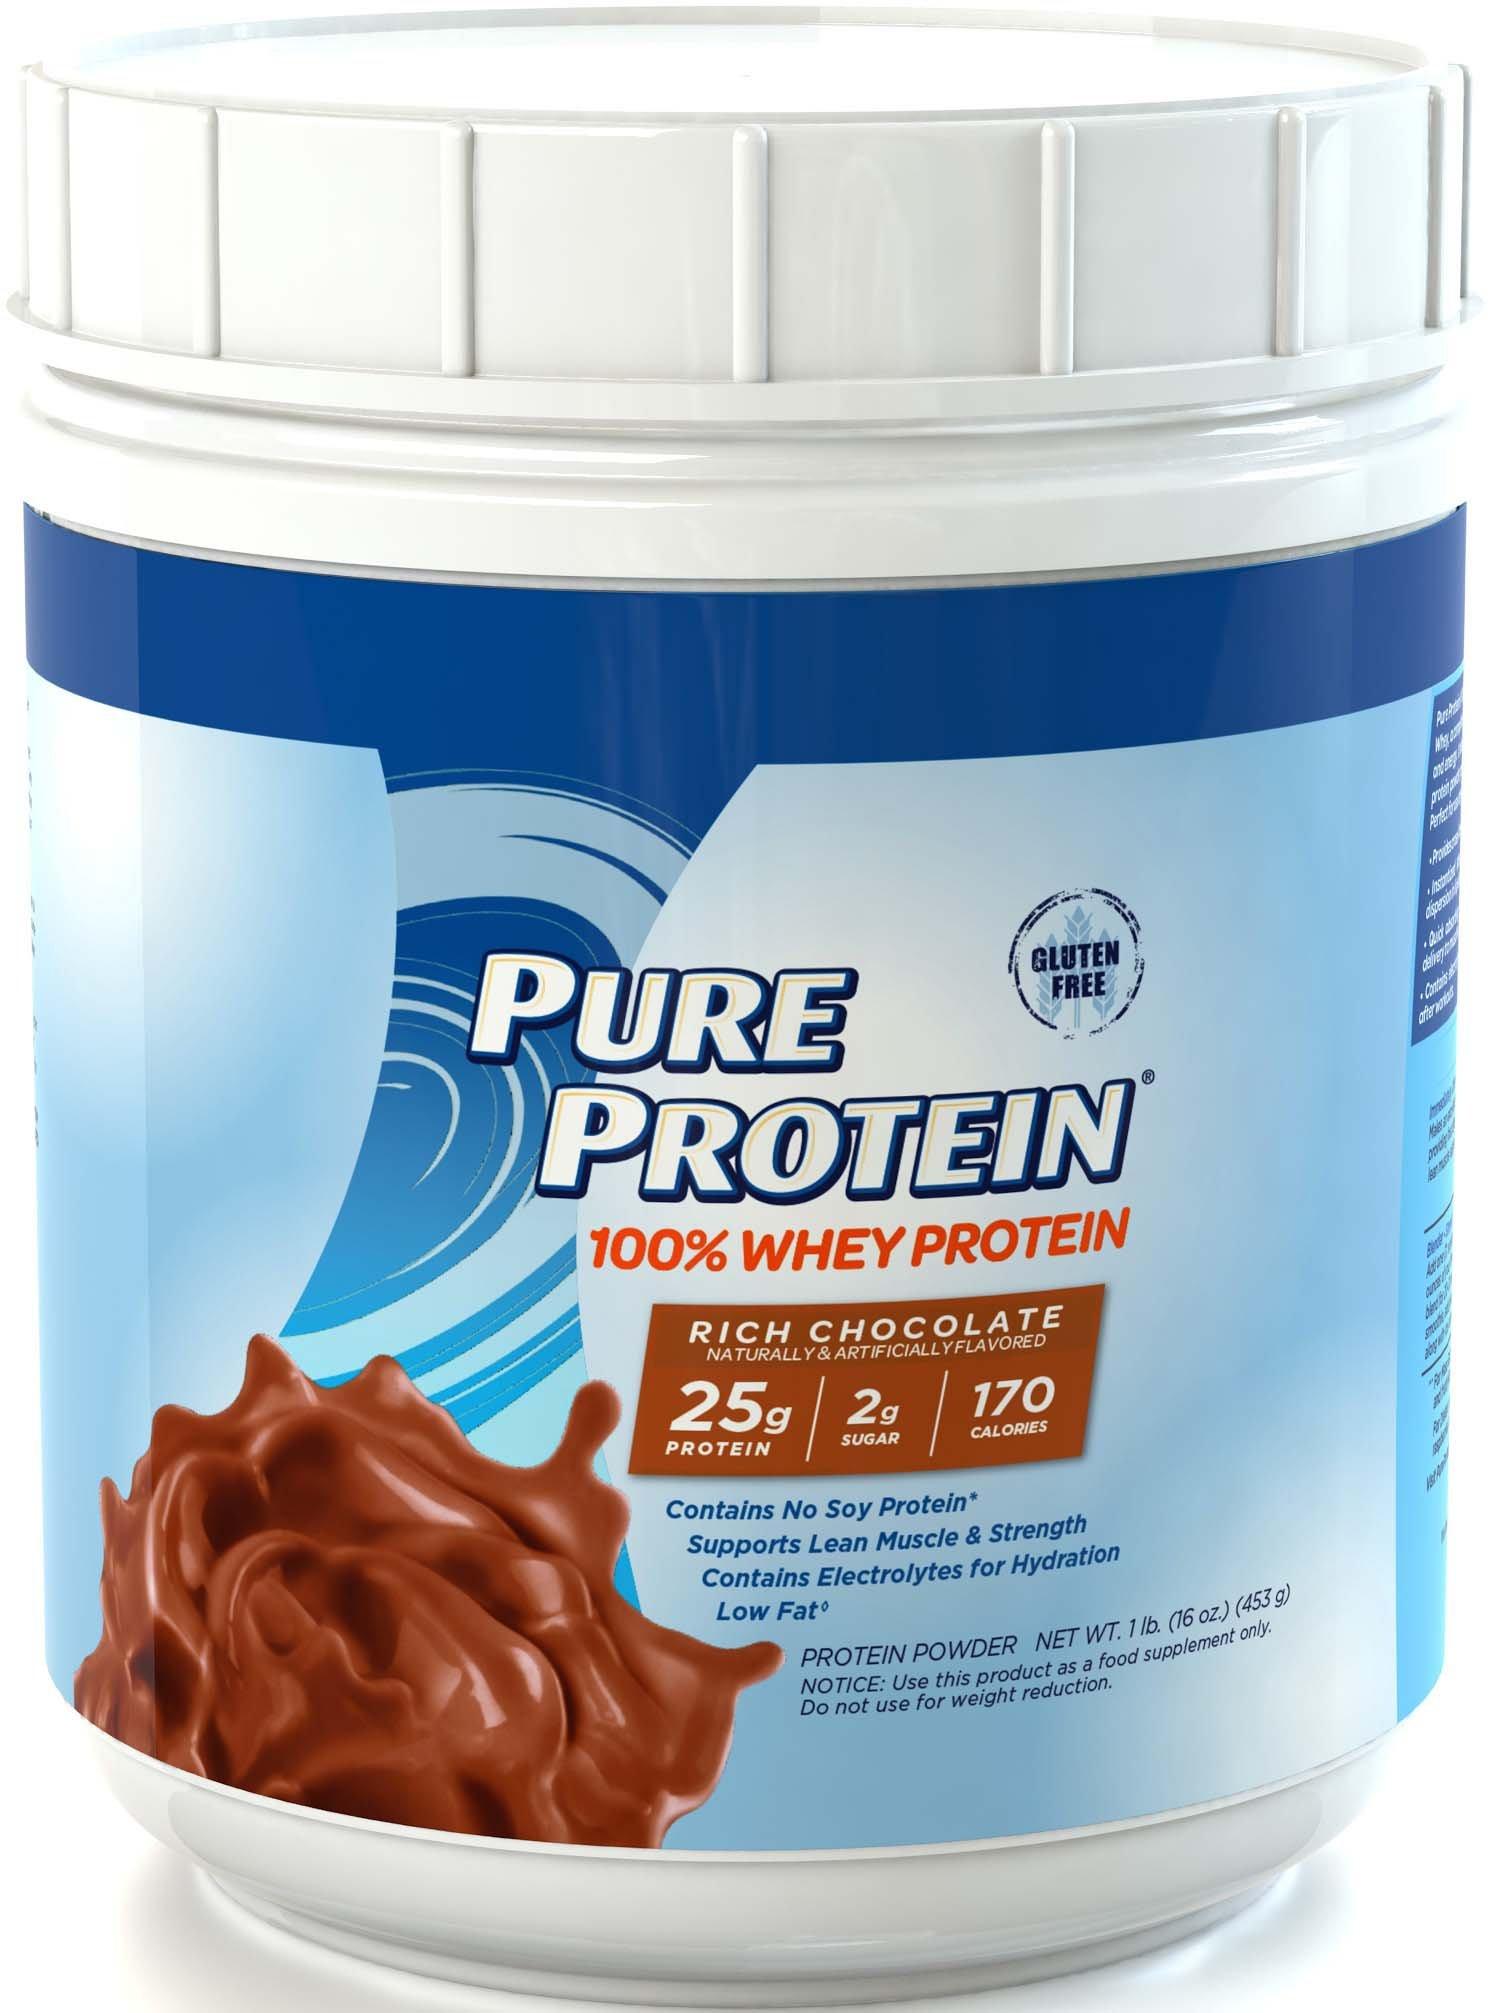 Protein powder international shipping